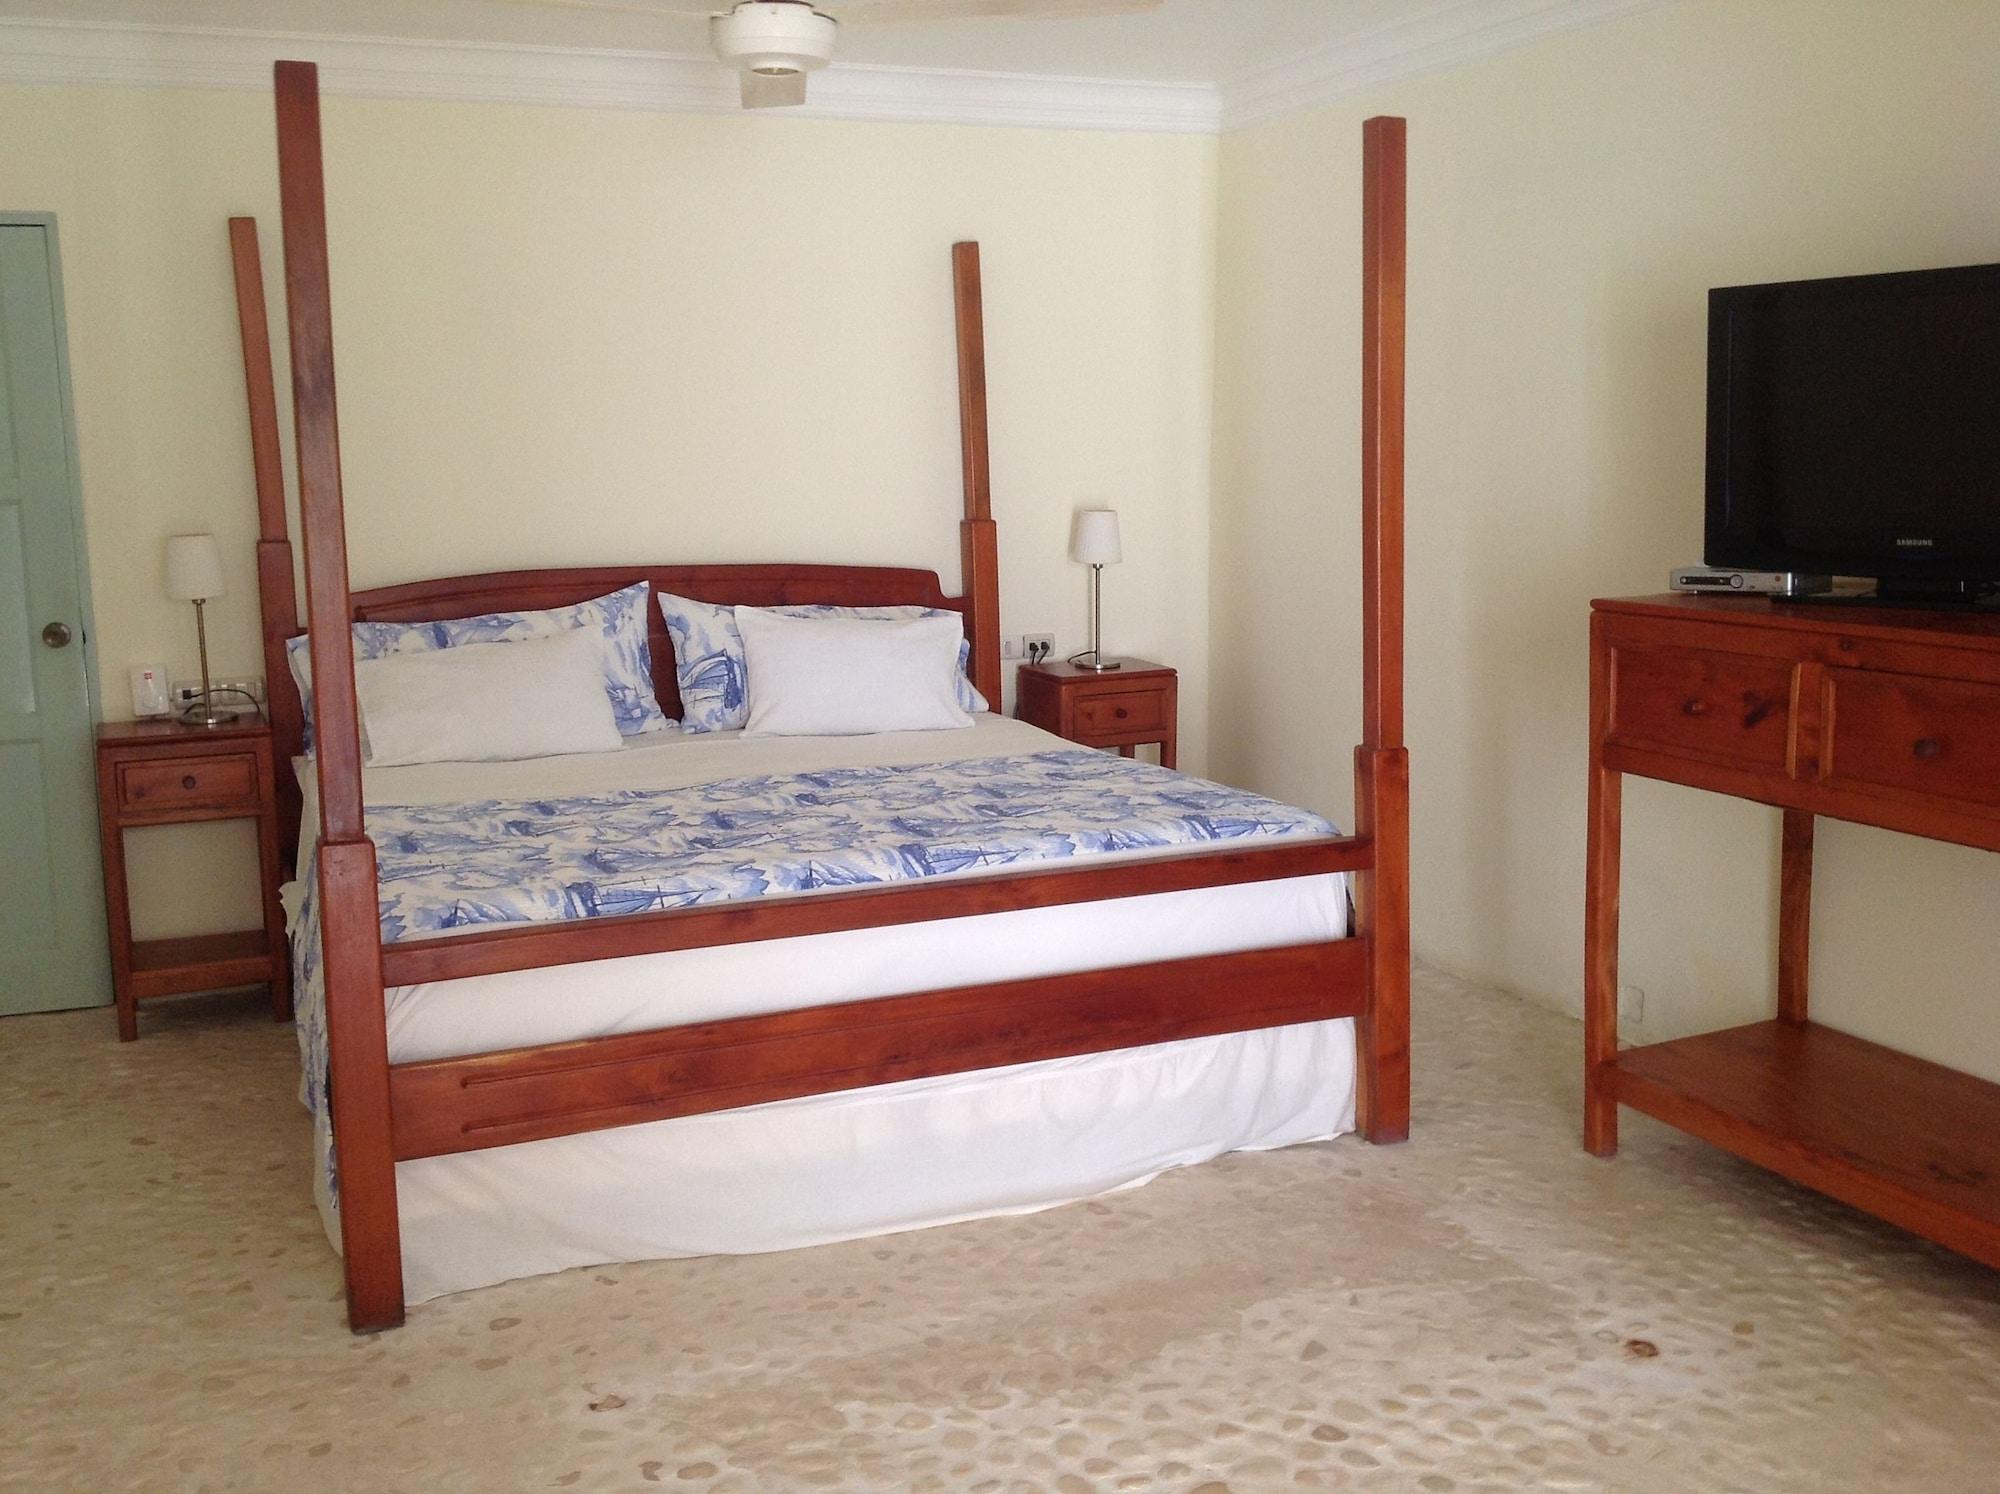 Hotel Piratas del Caribe, Paraiso